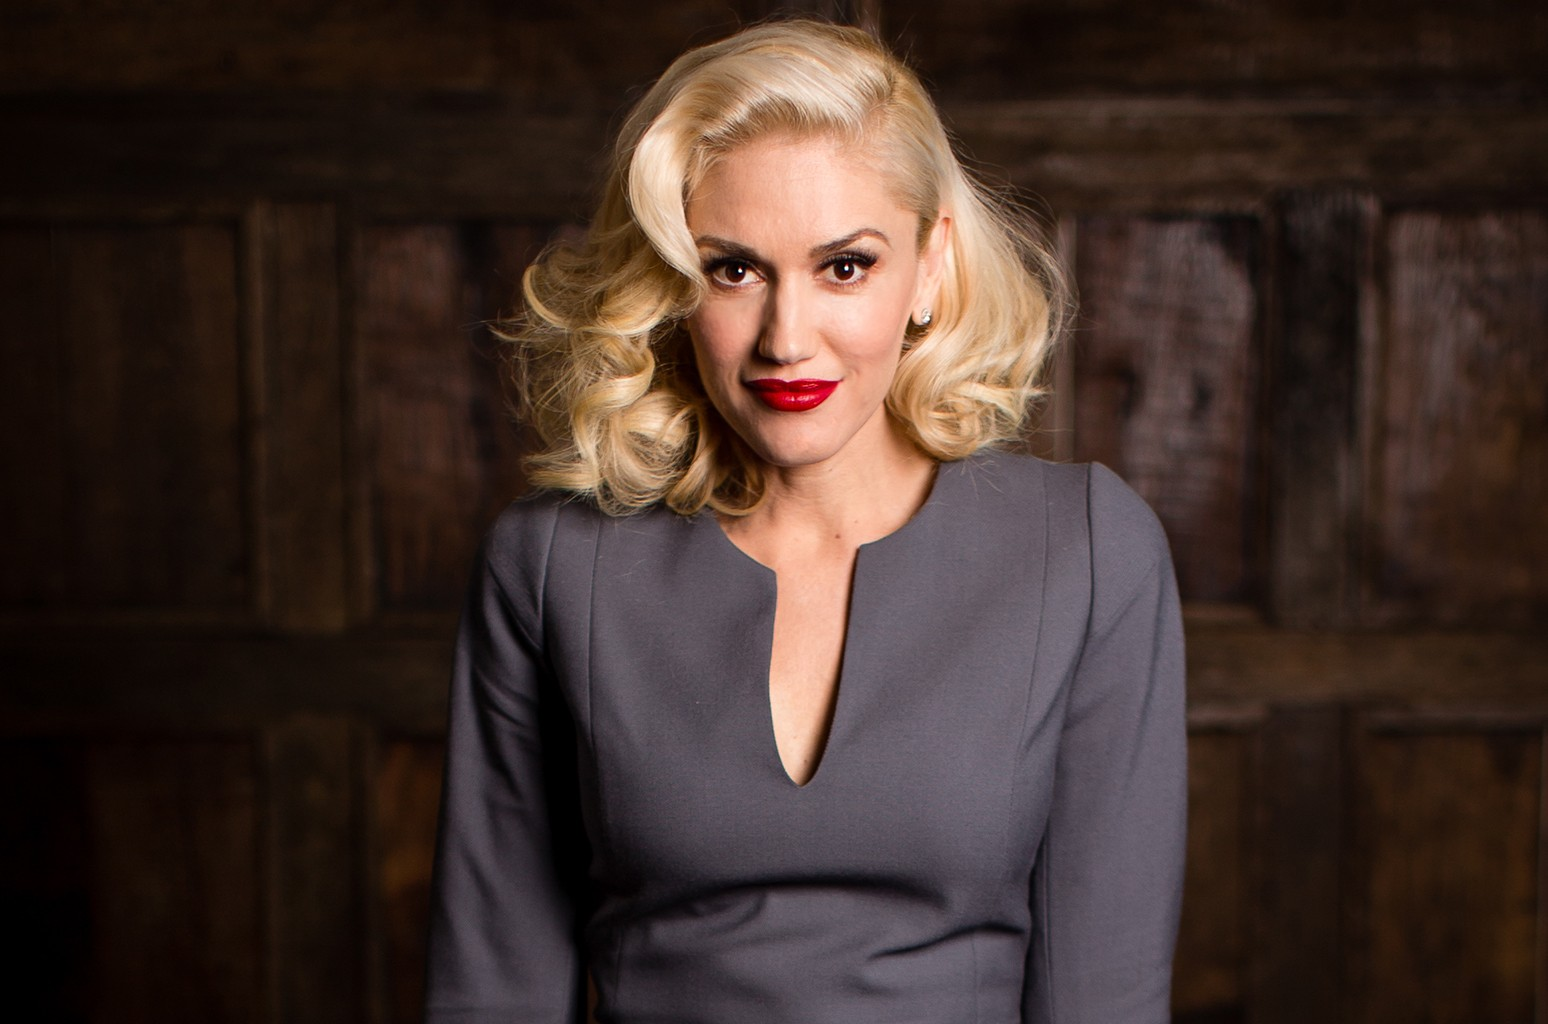 Gwen Stefani at the Orpheum